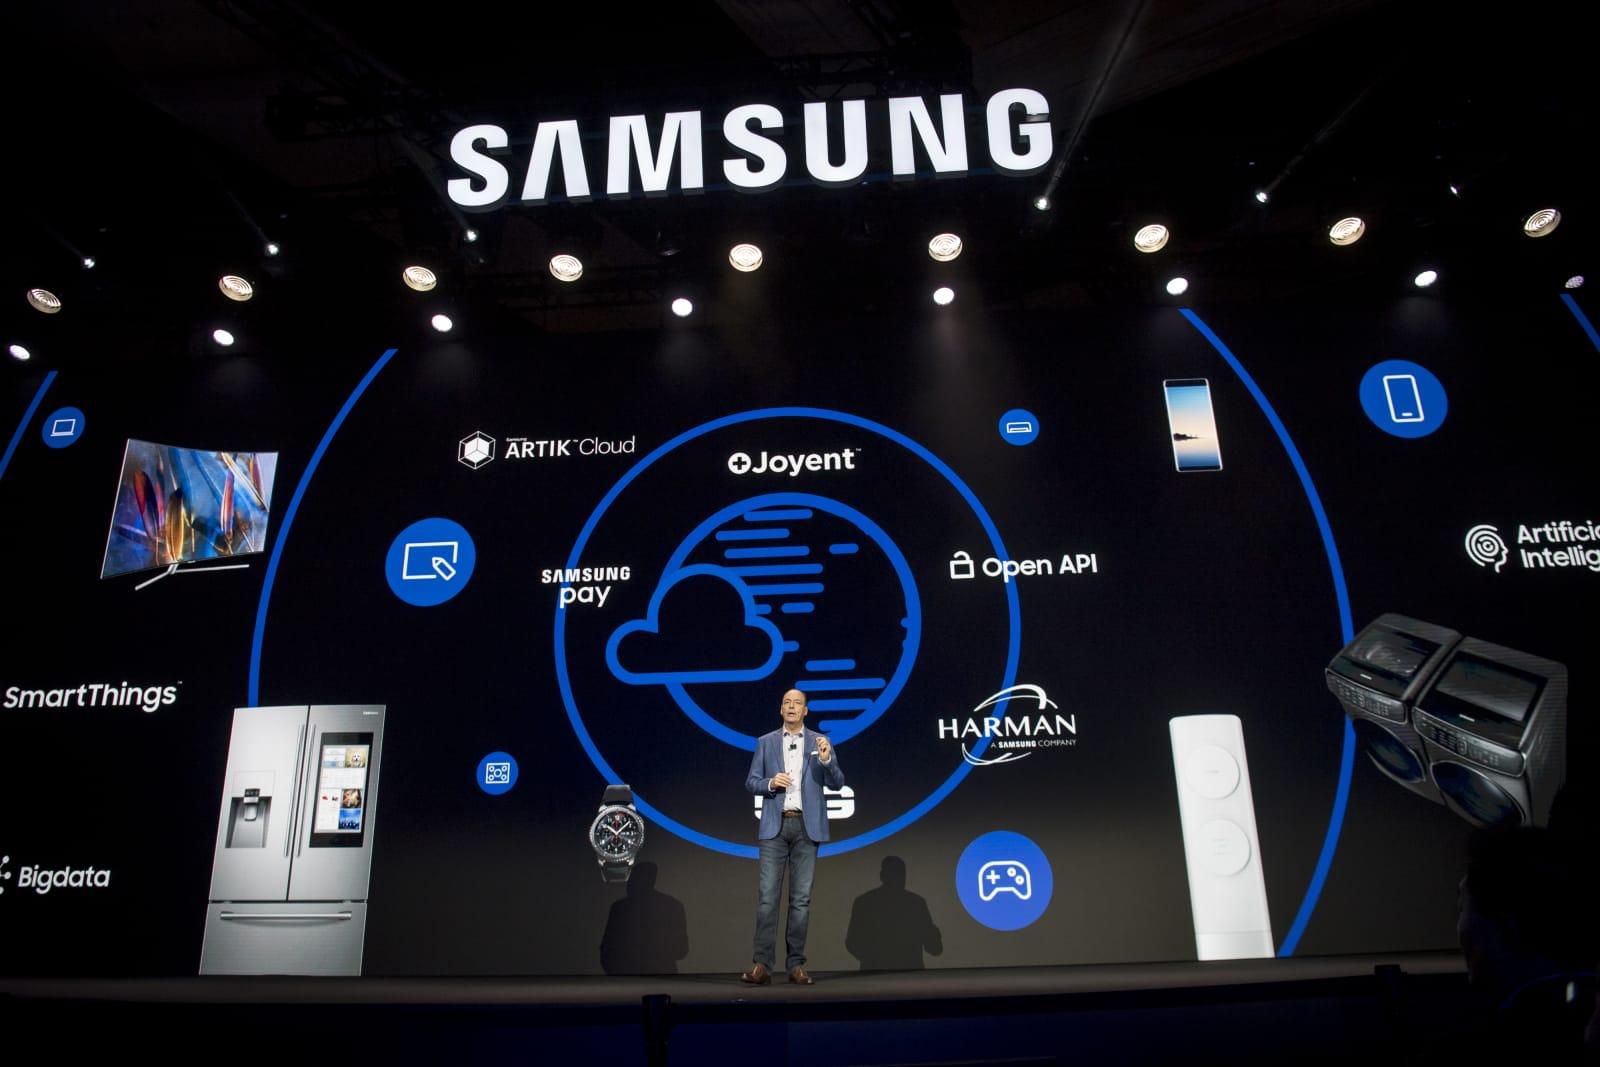 Samsung commits $22 billion to AI, 5G and future tech